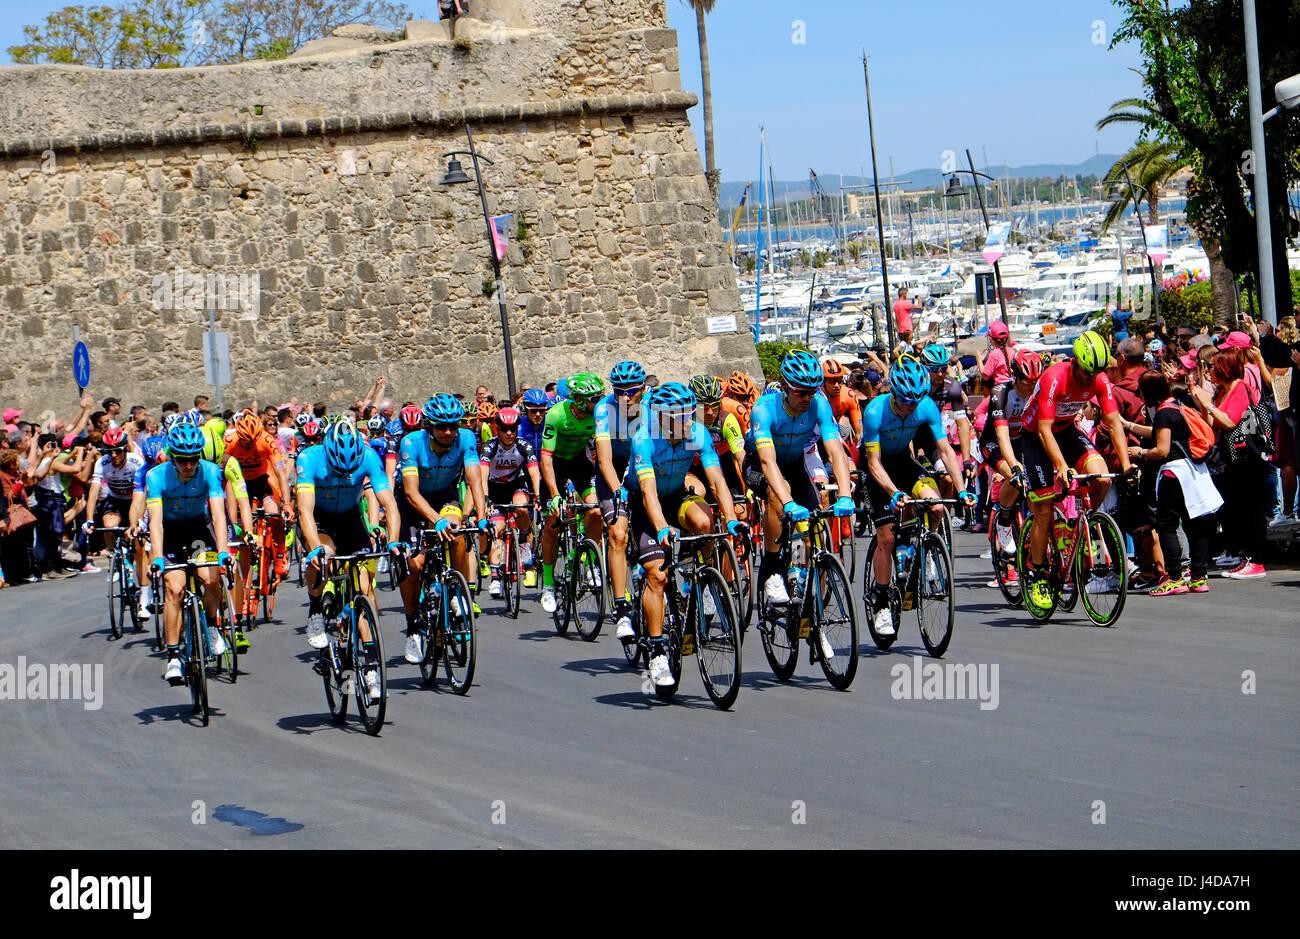 Comienzo del giro d'Italia, carrera ciclista, Alghero (Cerdeña, Italia) Imagen De Stock